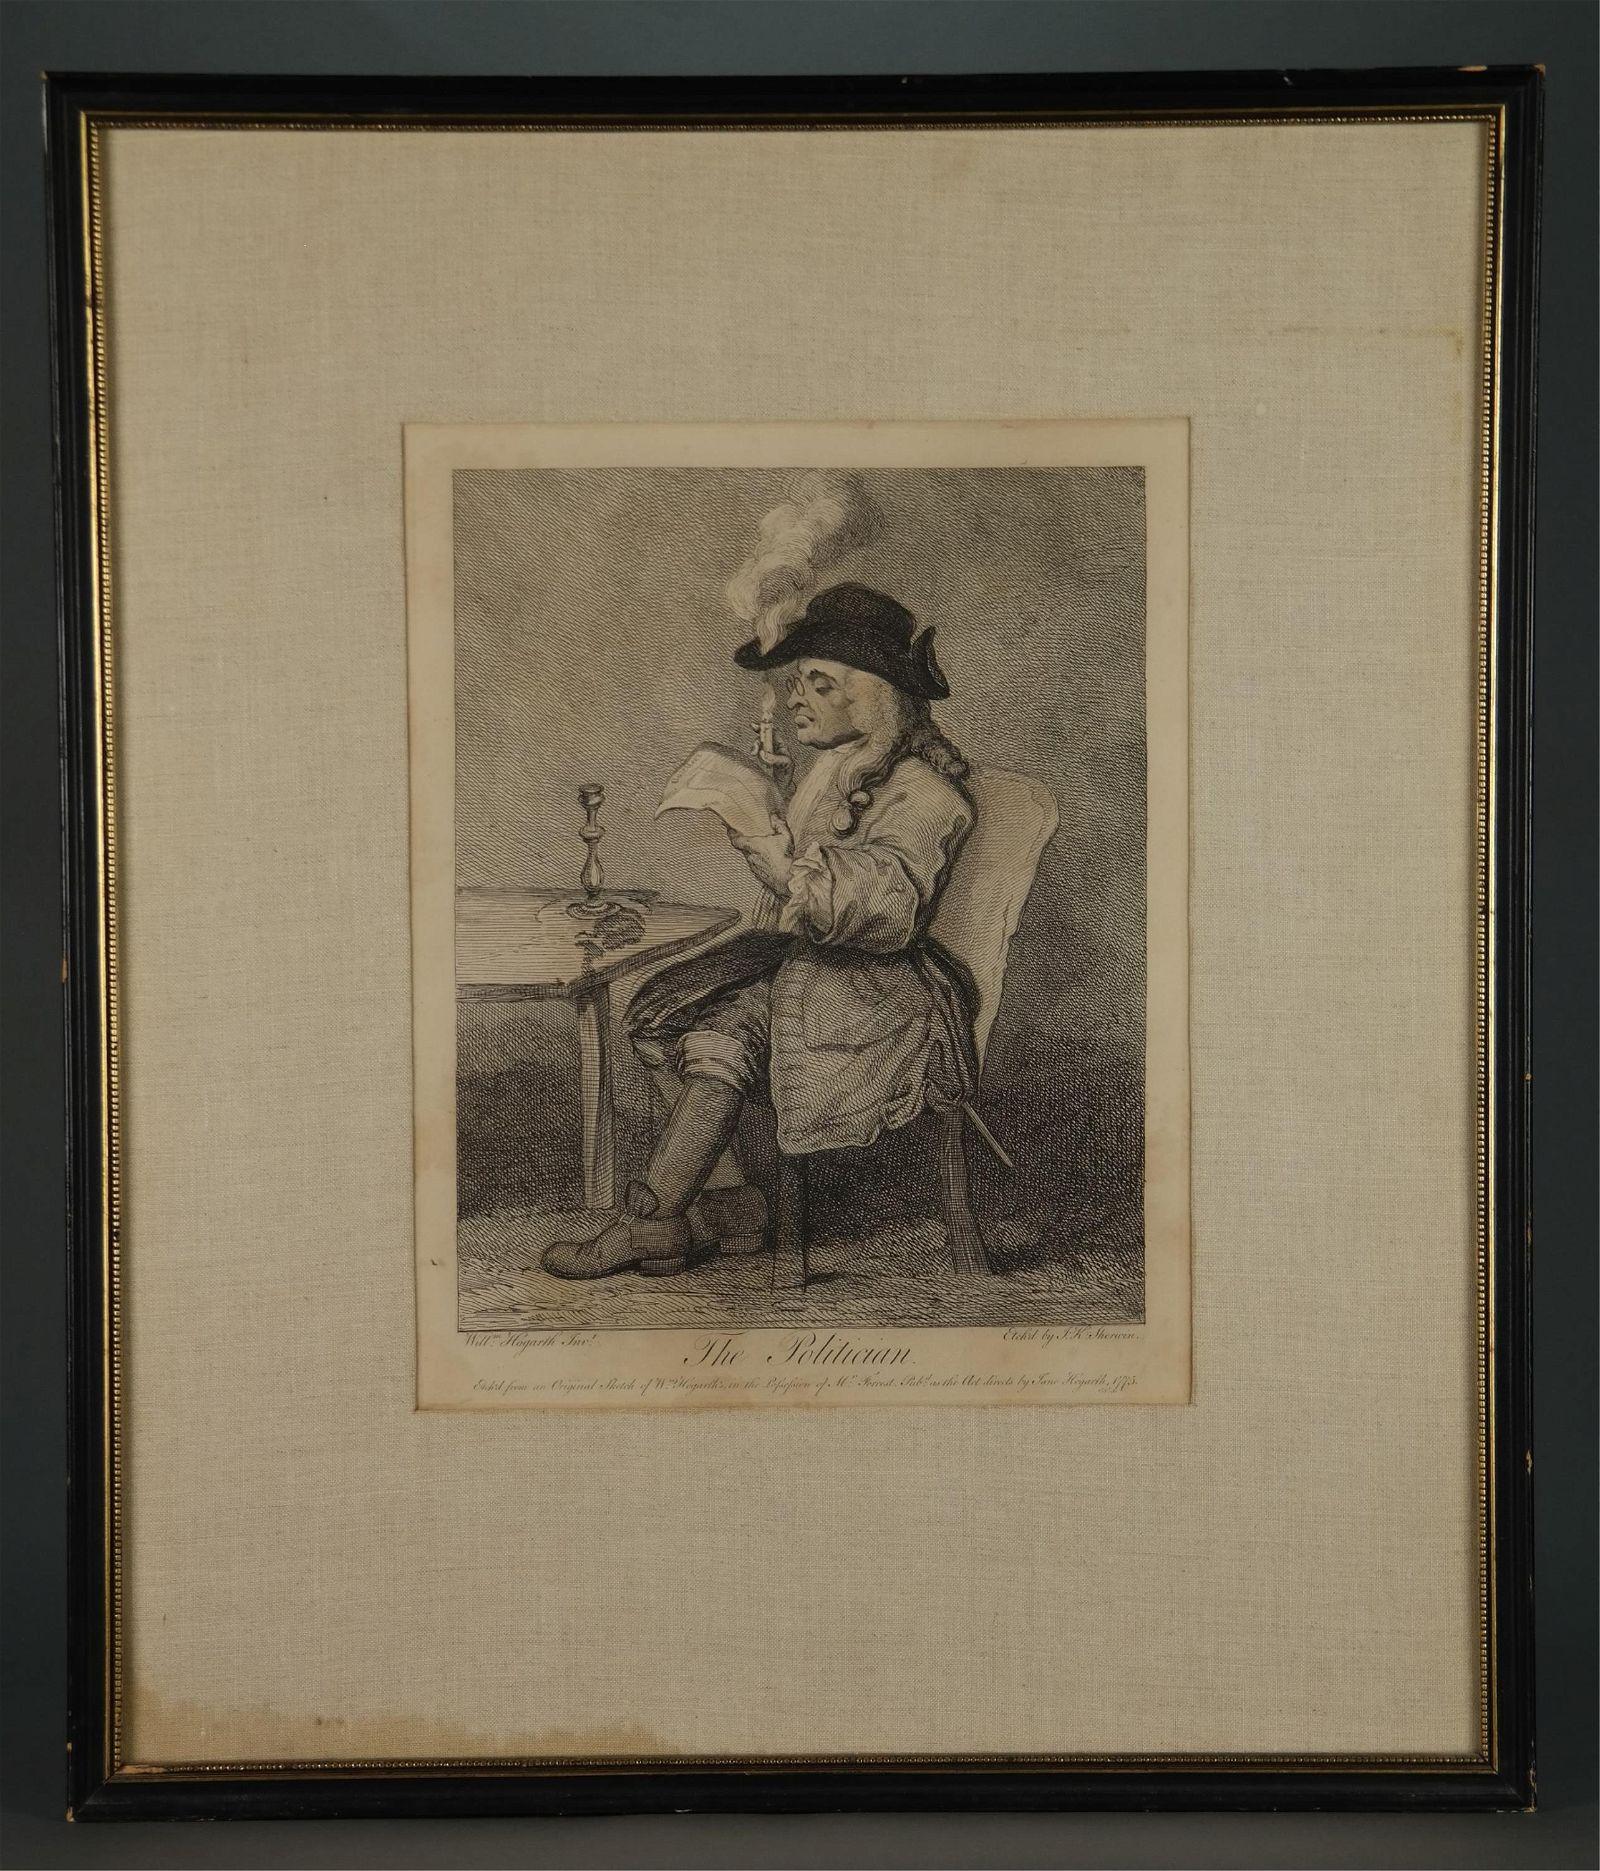 Hogarth. The Politician. 1775.